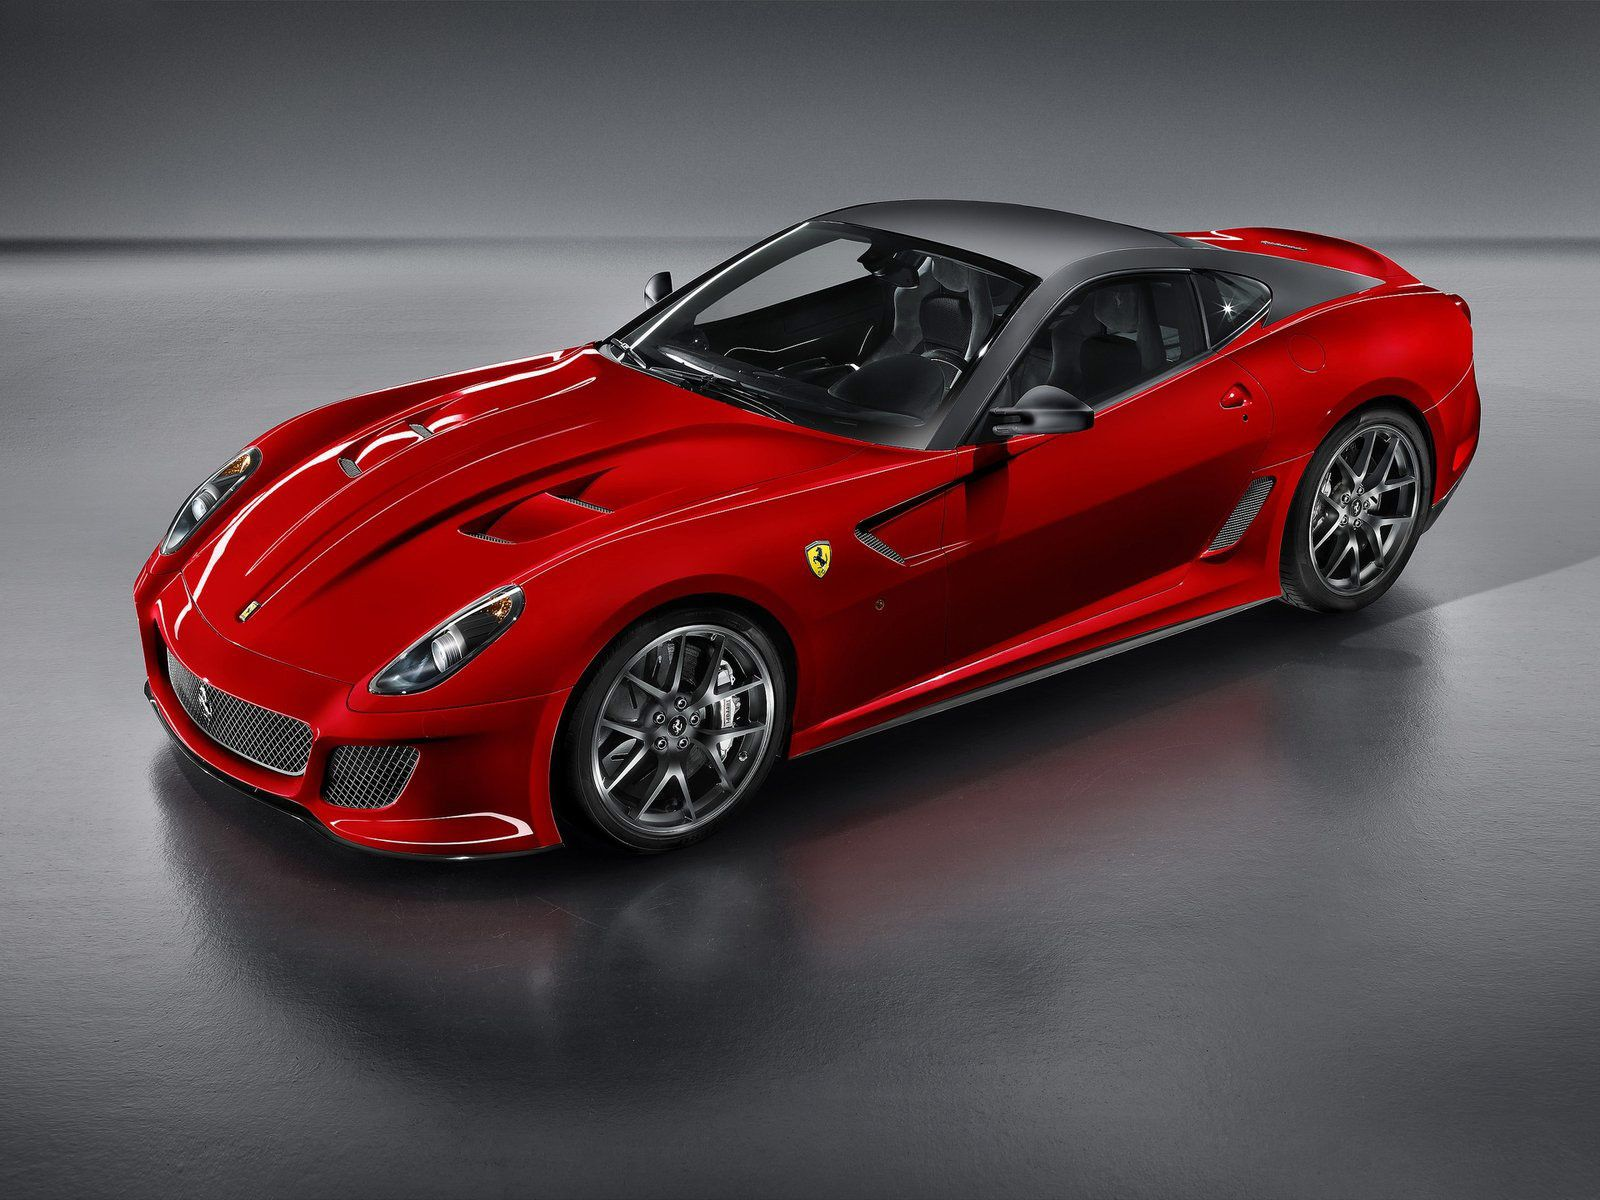 2011 Ferrari 599 GTO (2011)